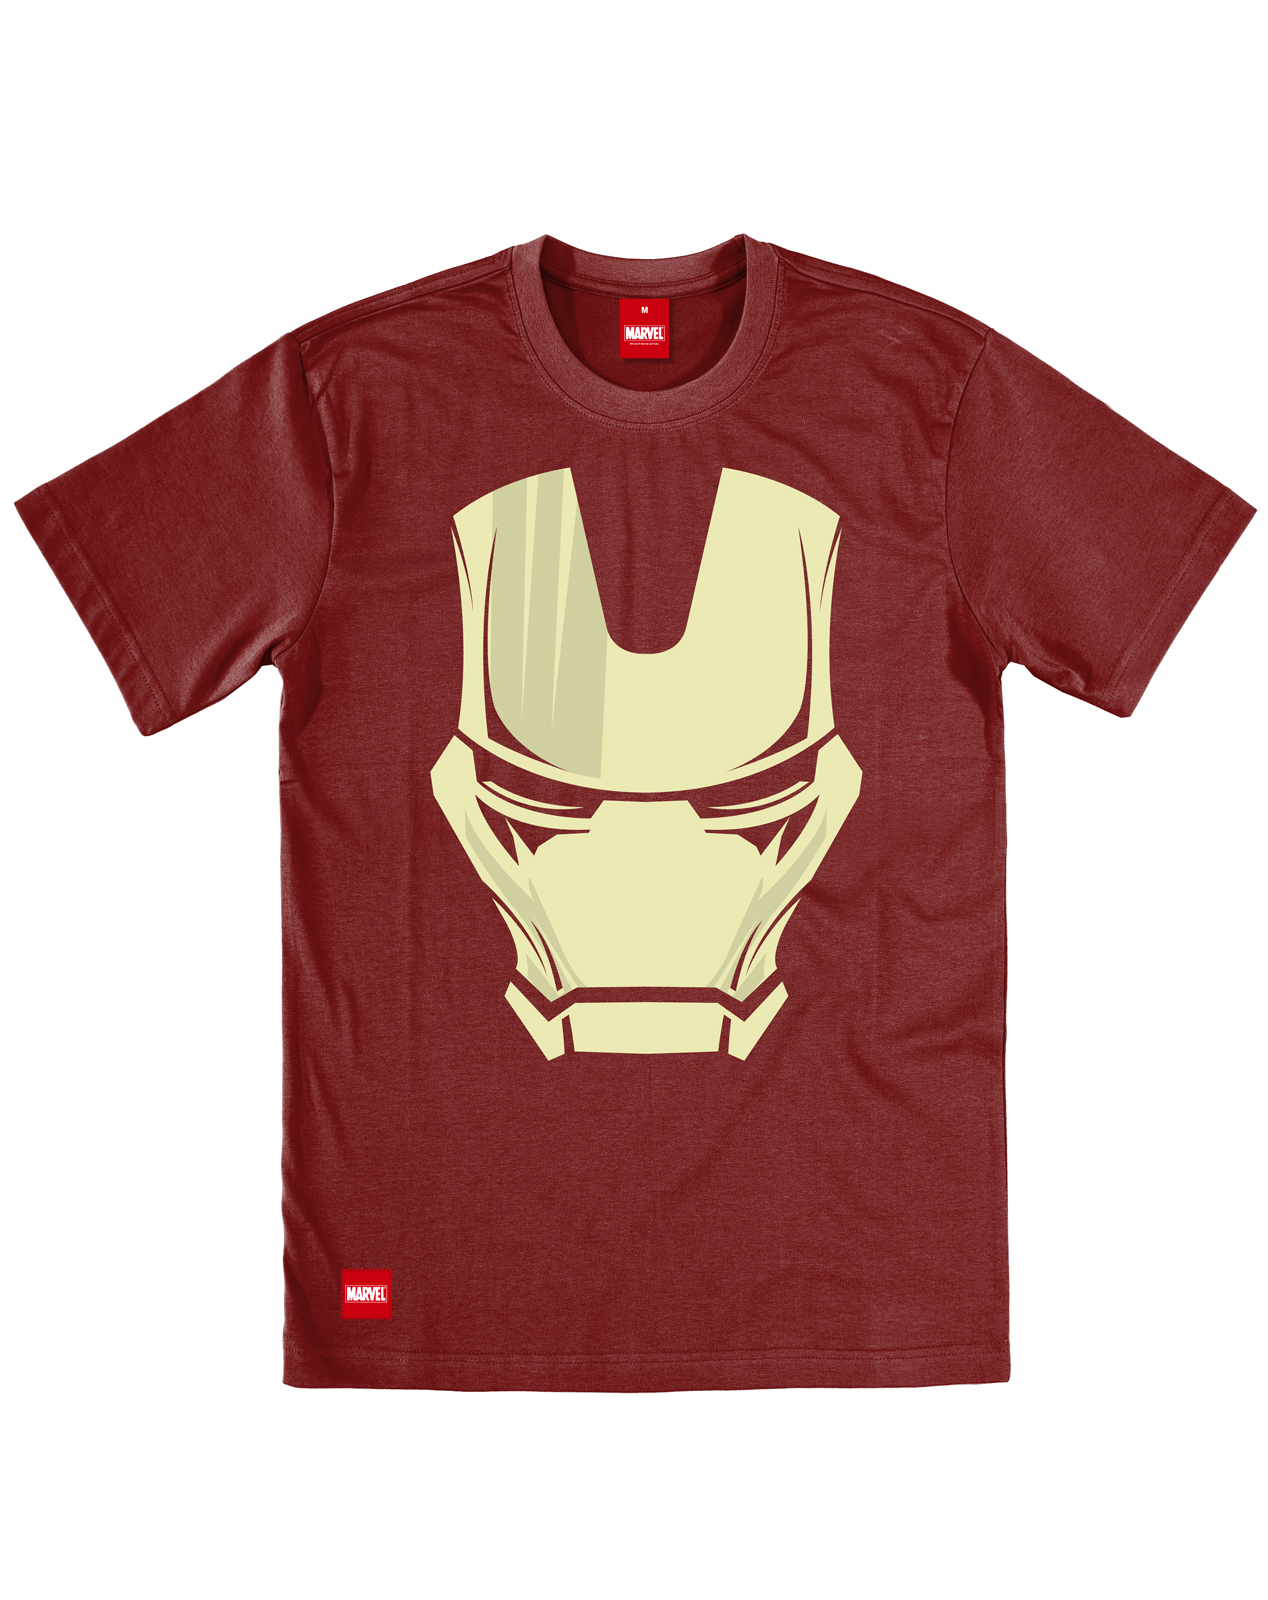 addict marvel iron man face superhero comic oxblood maroon. Black Bedroom Furniture Sets. Home Design Ideas